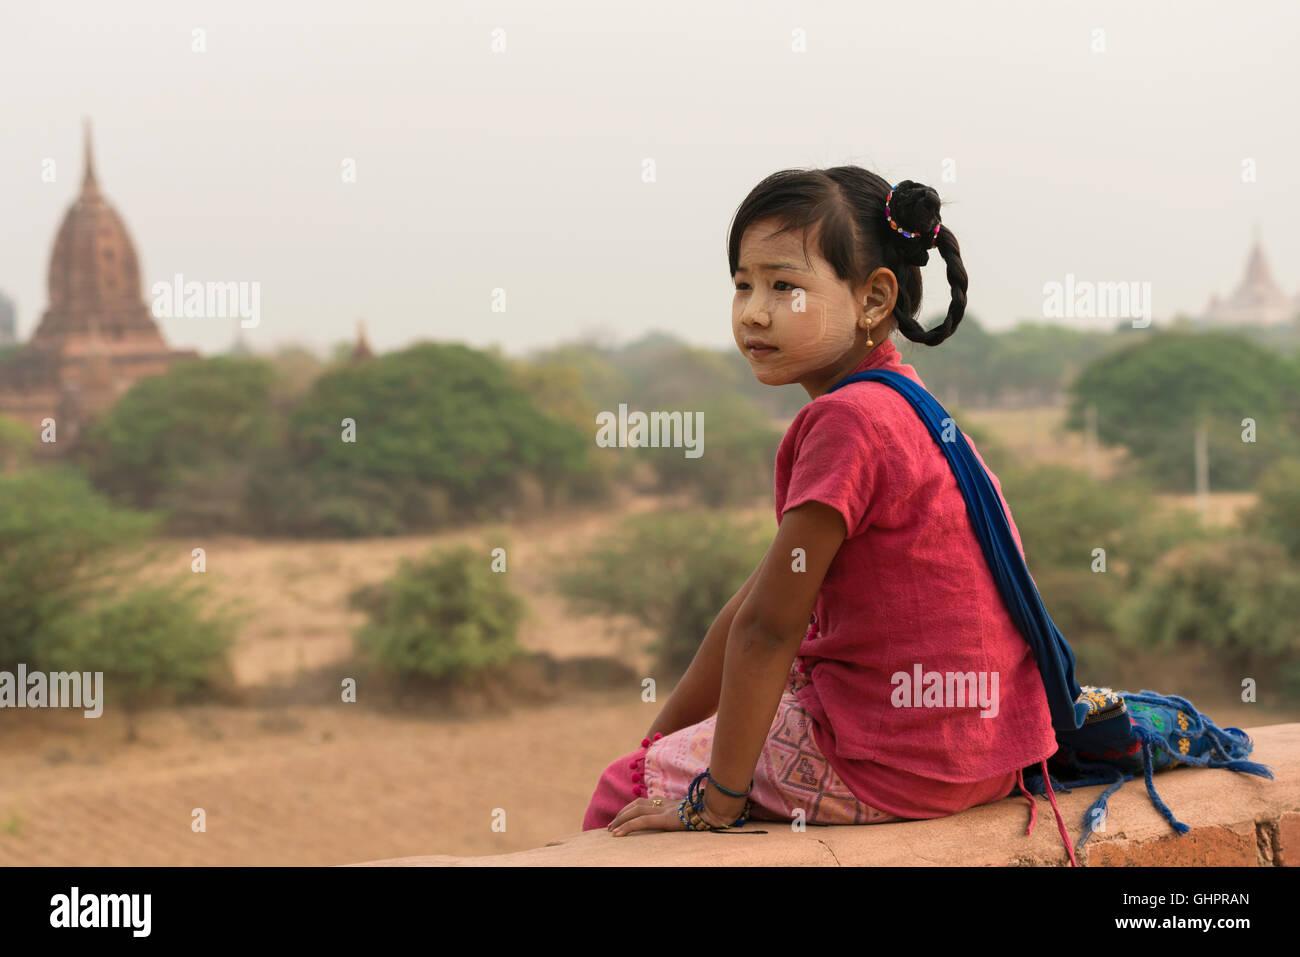 Asia, Burmese girls sat looking very hopeful. - Stock Image